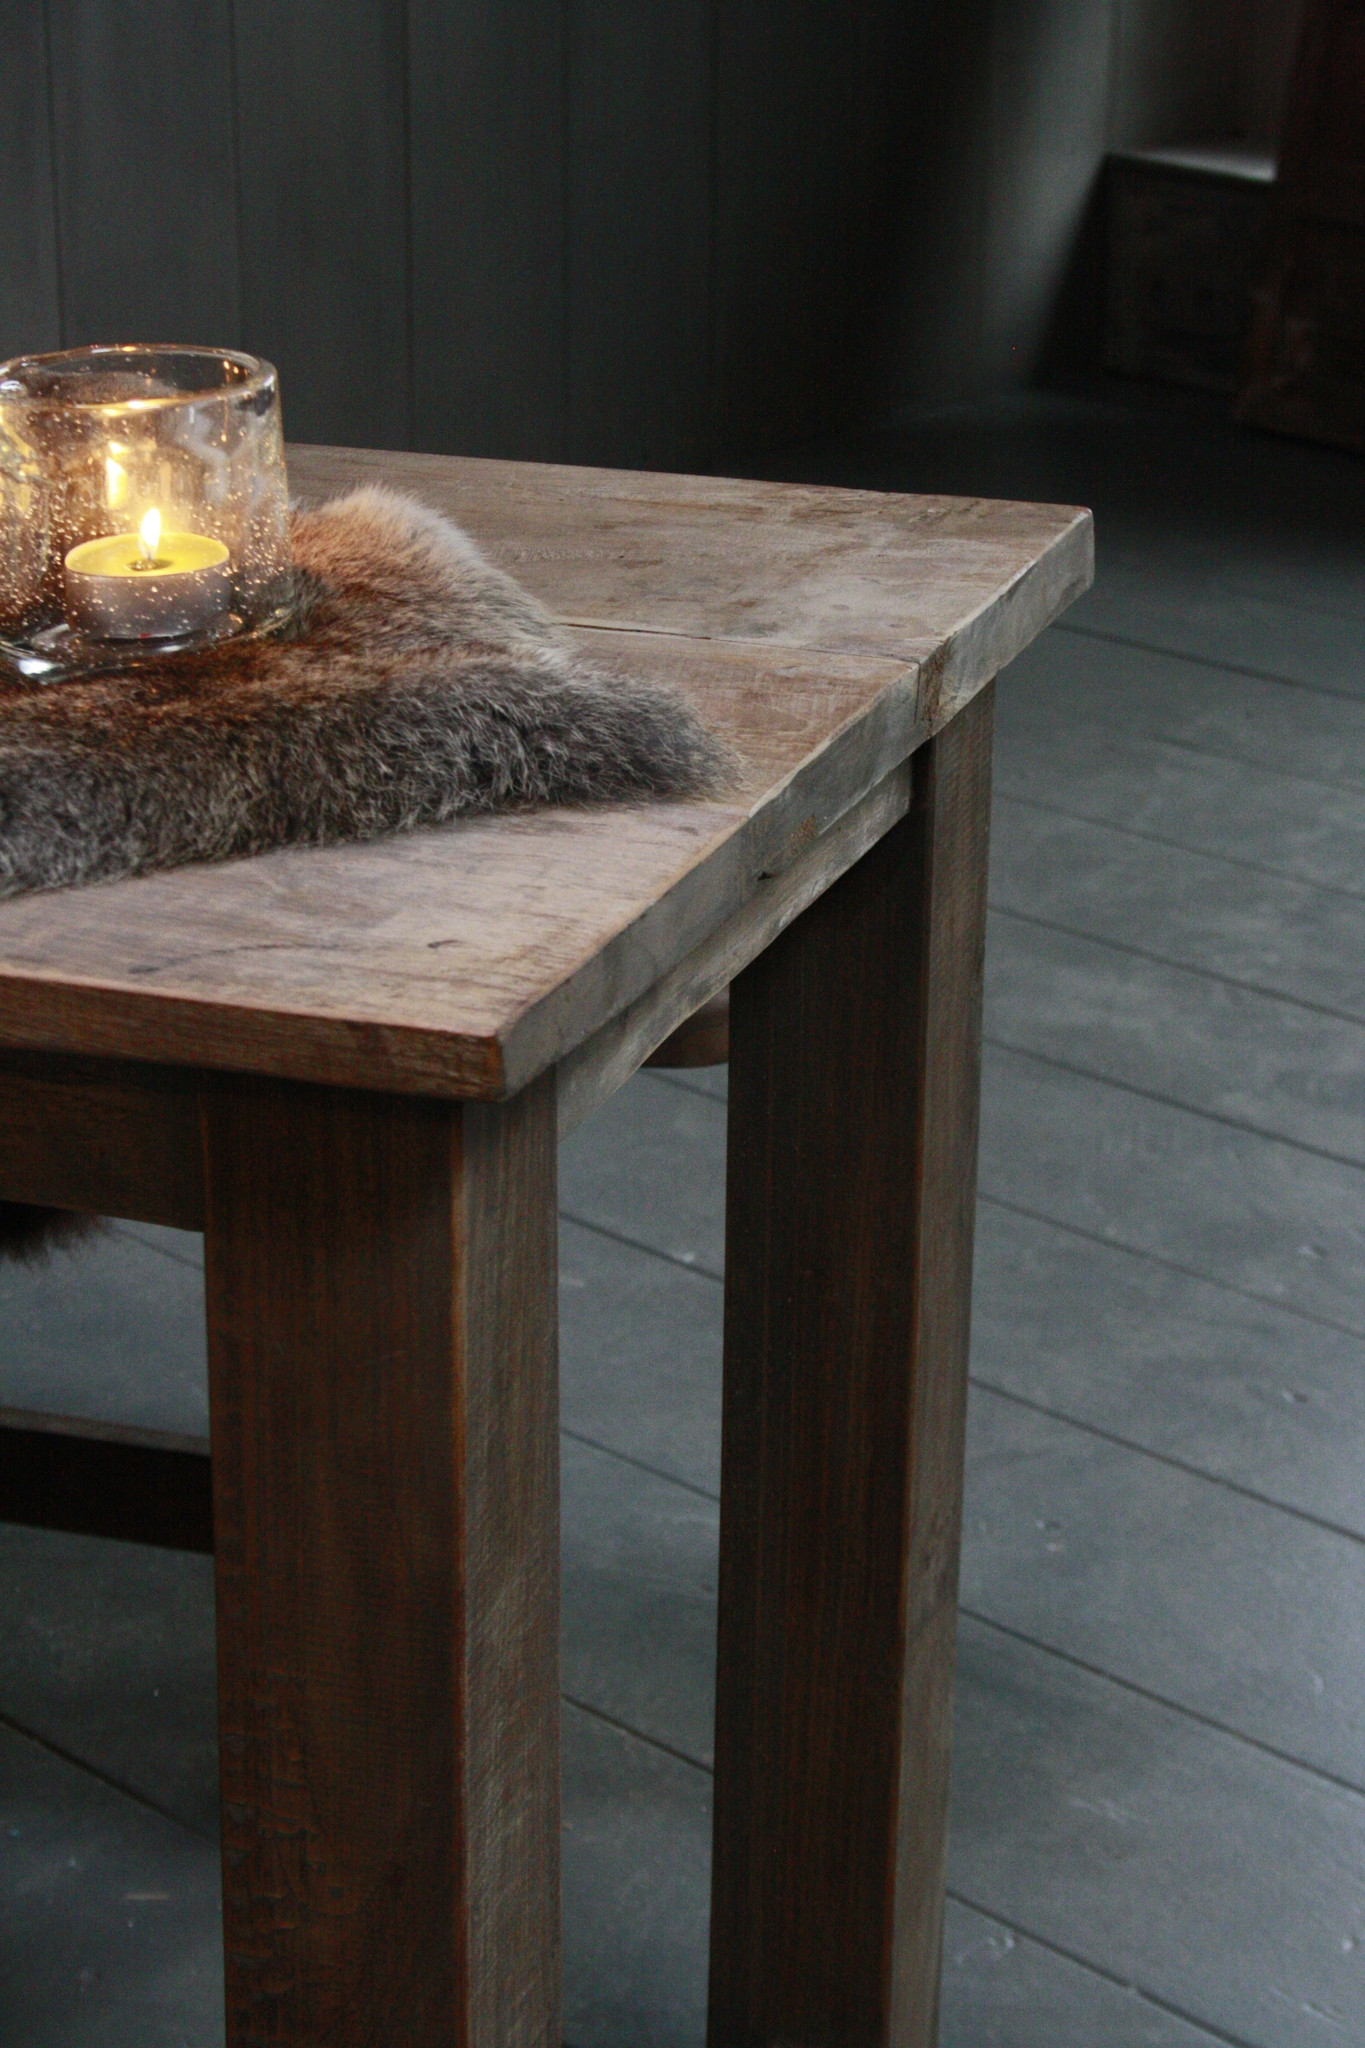 Oud houten eetkamer set met 2 houten bankjes-6